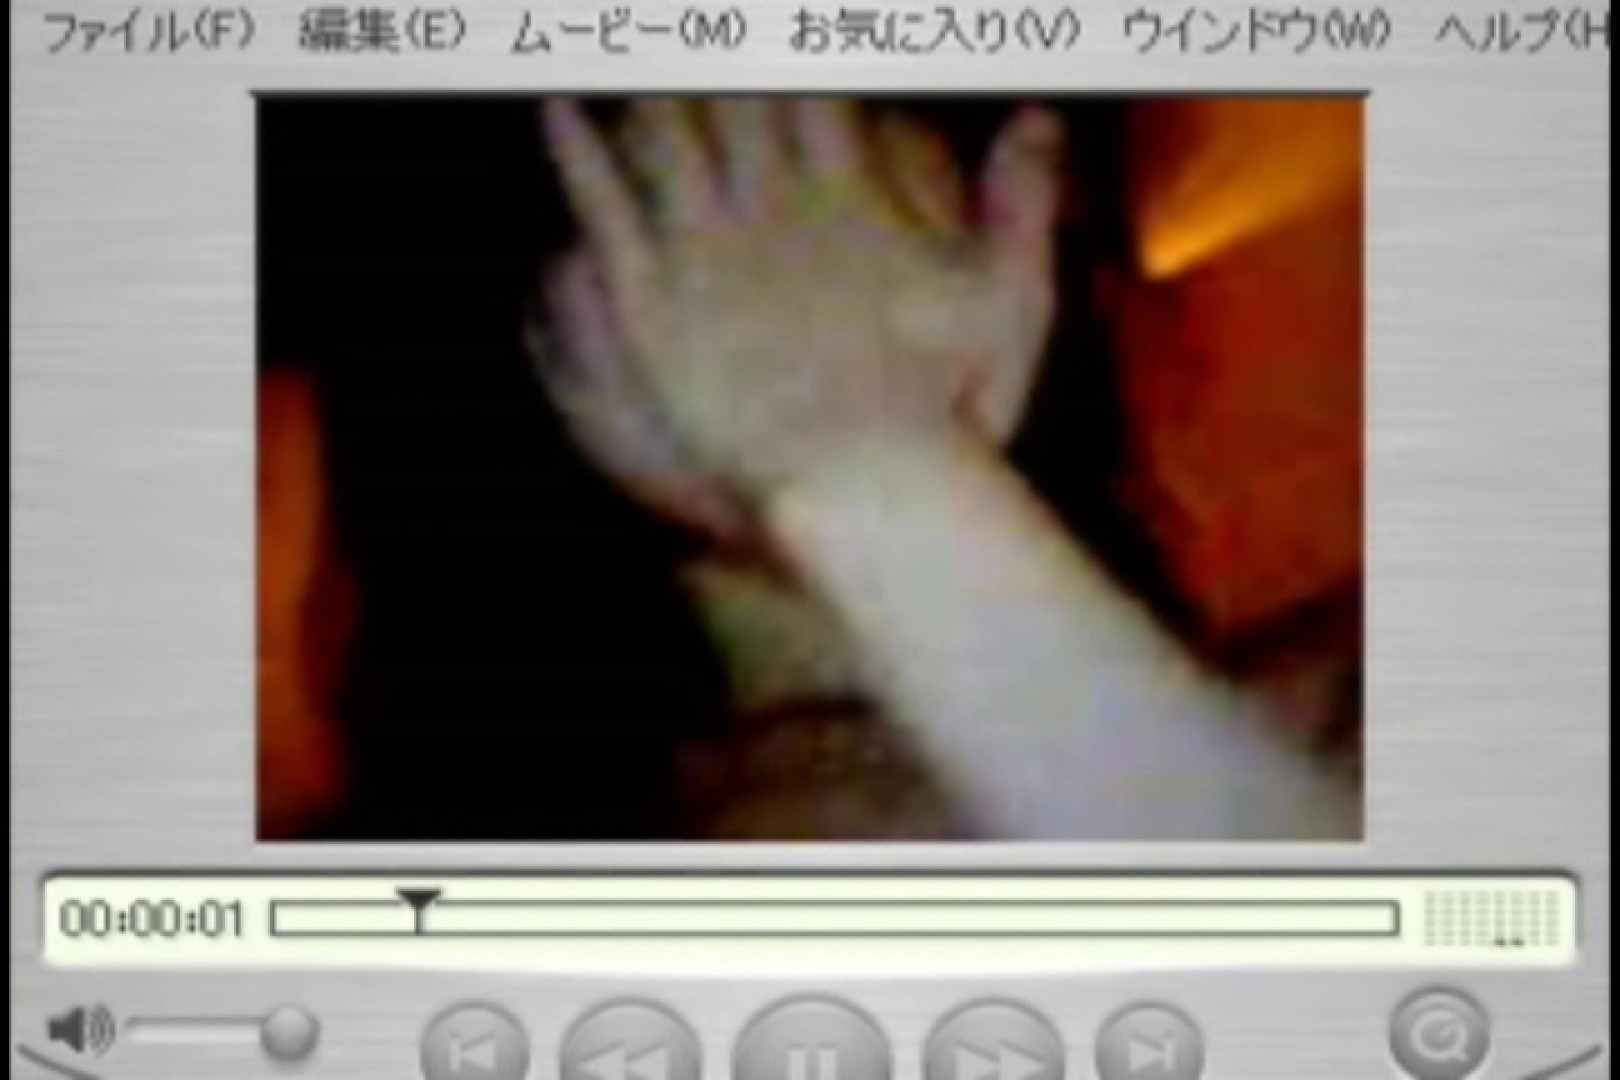 Shigeruのアルバム 流出作品  98pic 38